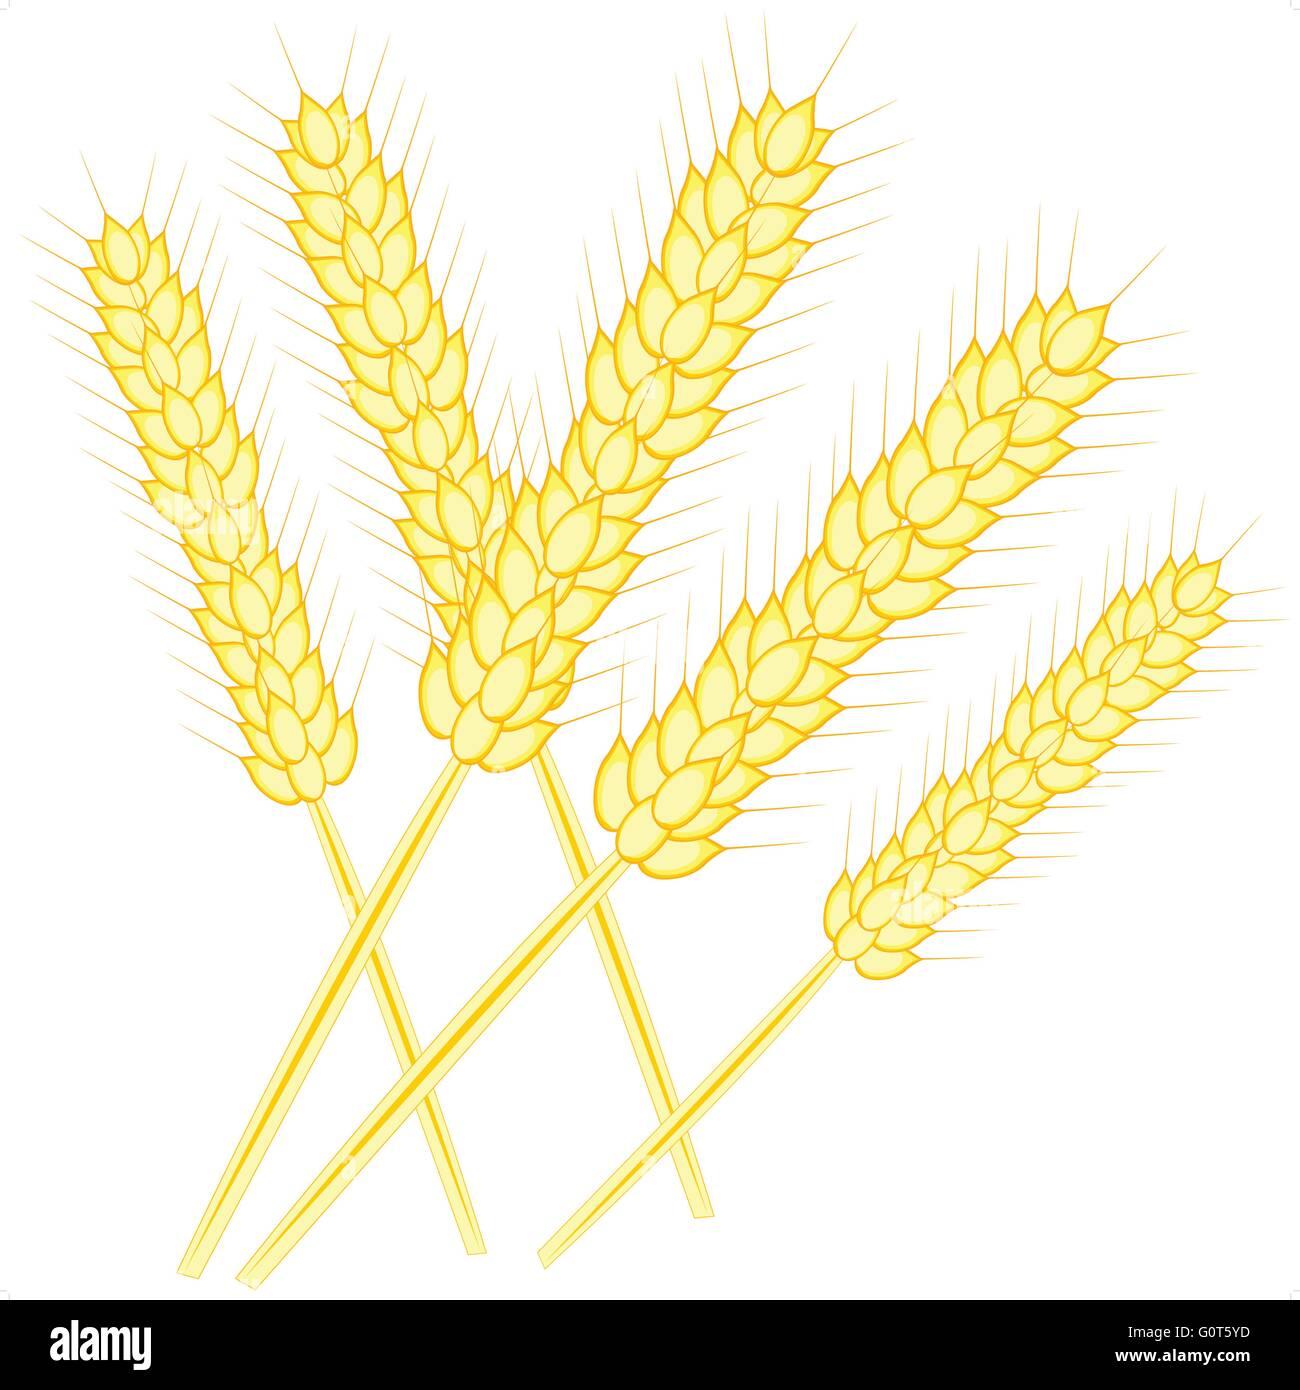 Ear of the wheat - Stock Vector